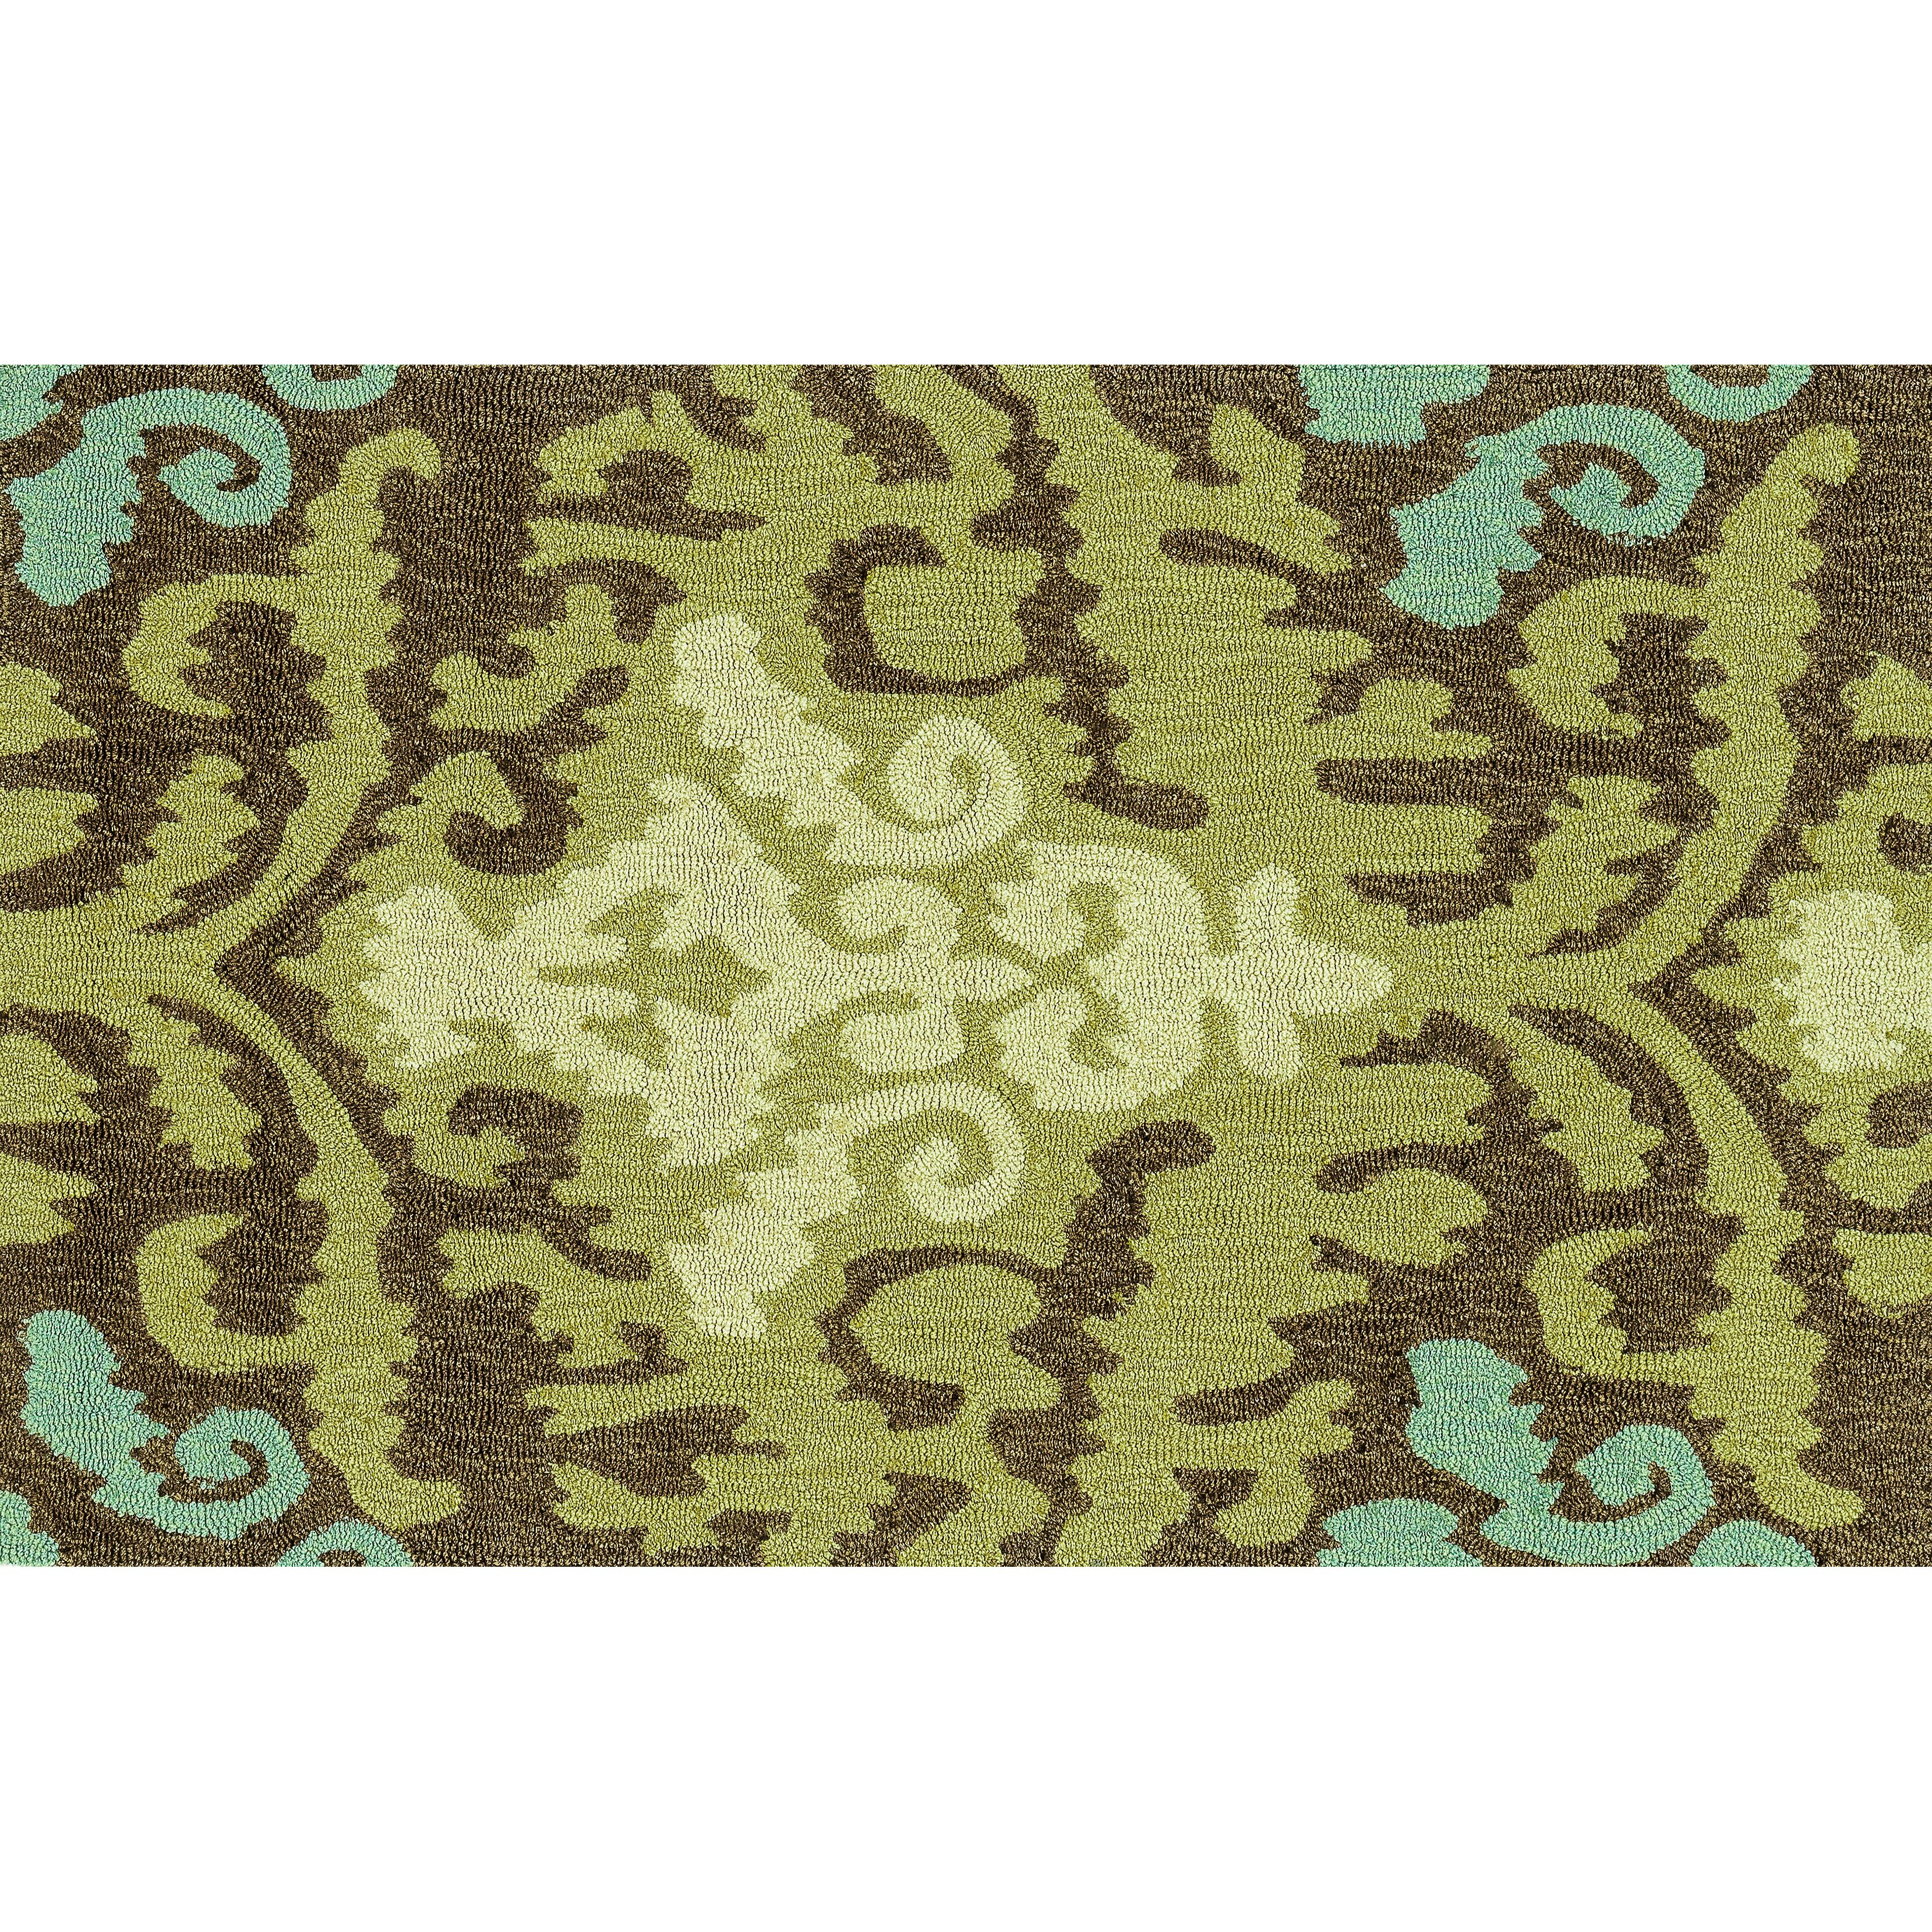 Outdoor carpet on gr carpet vidalondon outdoor carpet loloi rugs francesca brown green area rug gr carpet baanklon Choice Image